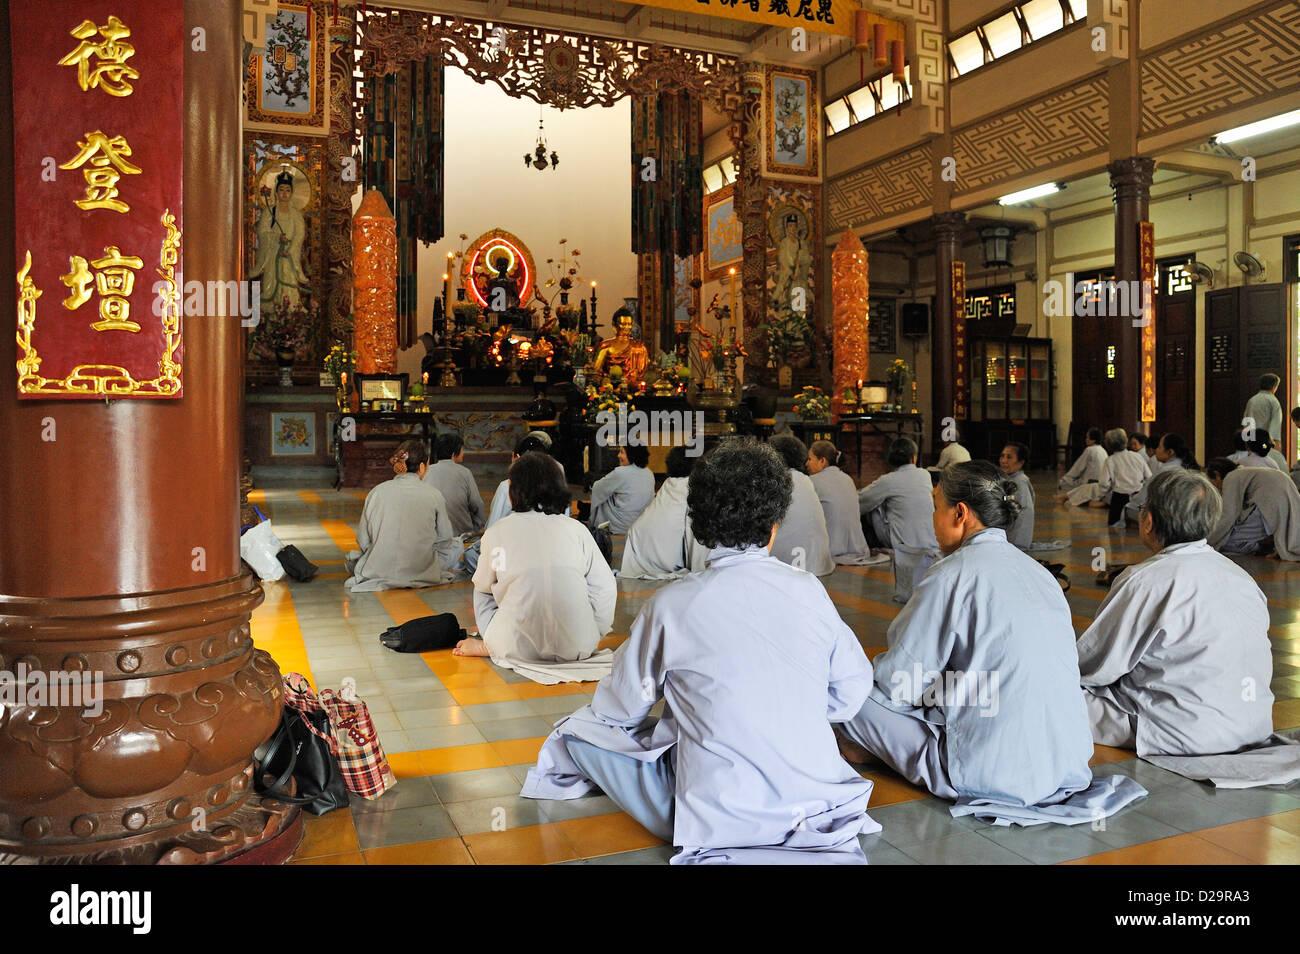 Buddhist women praying at Long Son Pagoda, Nha Trang, Vietnam - Stock Image